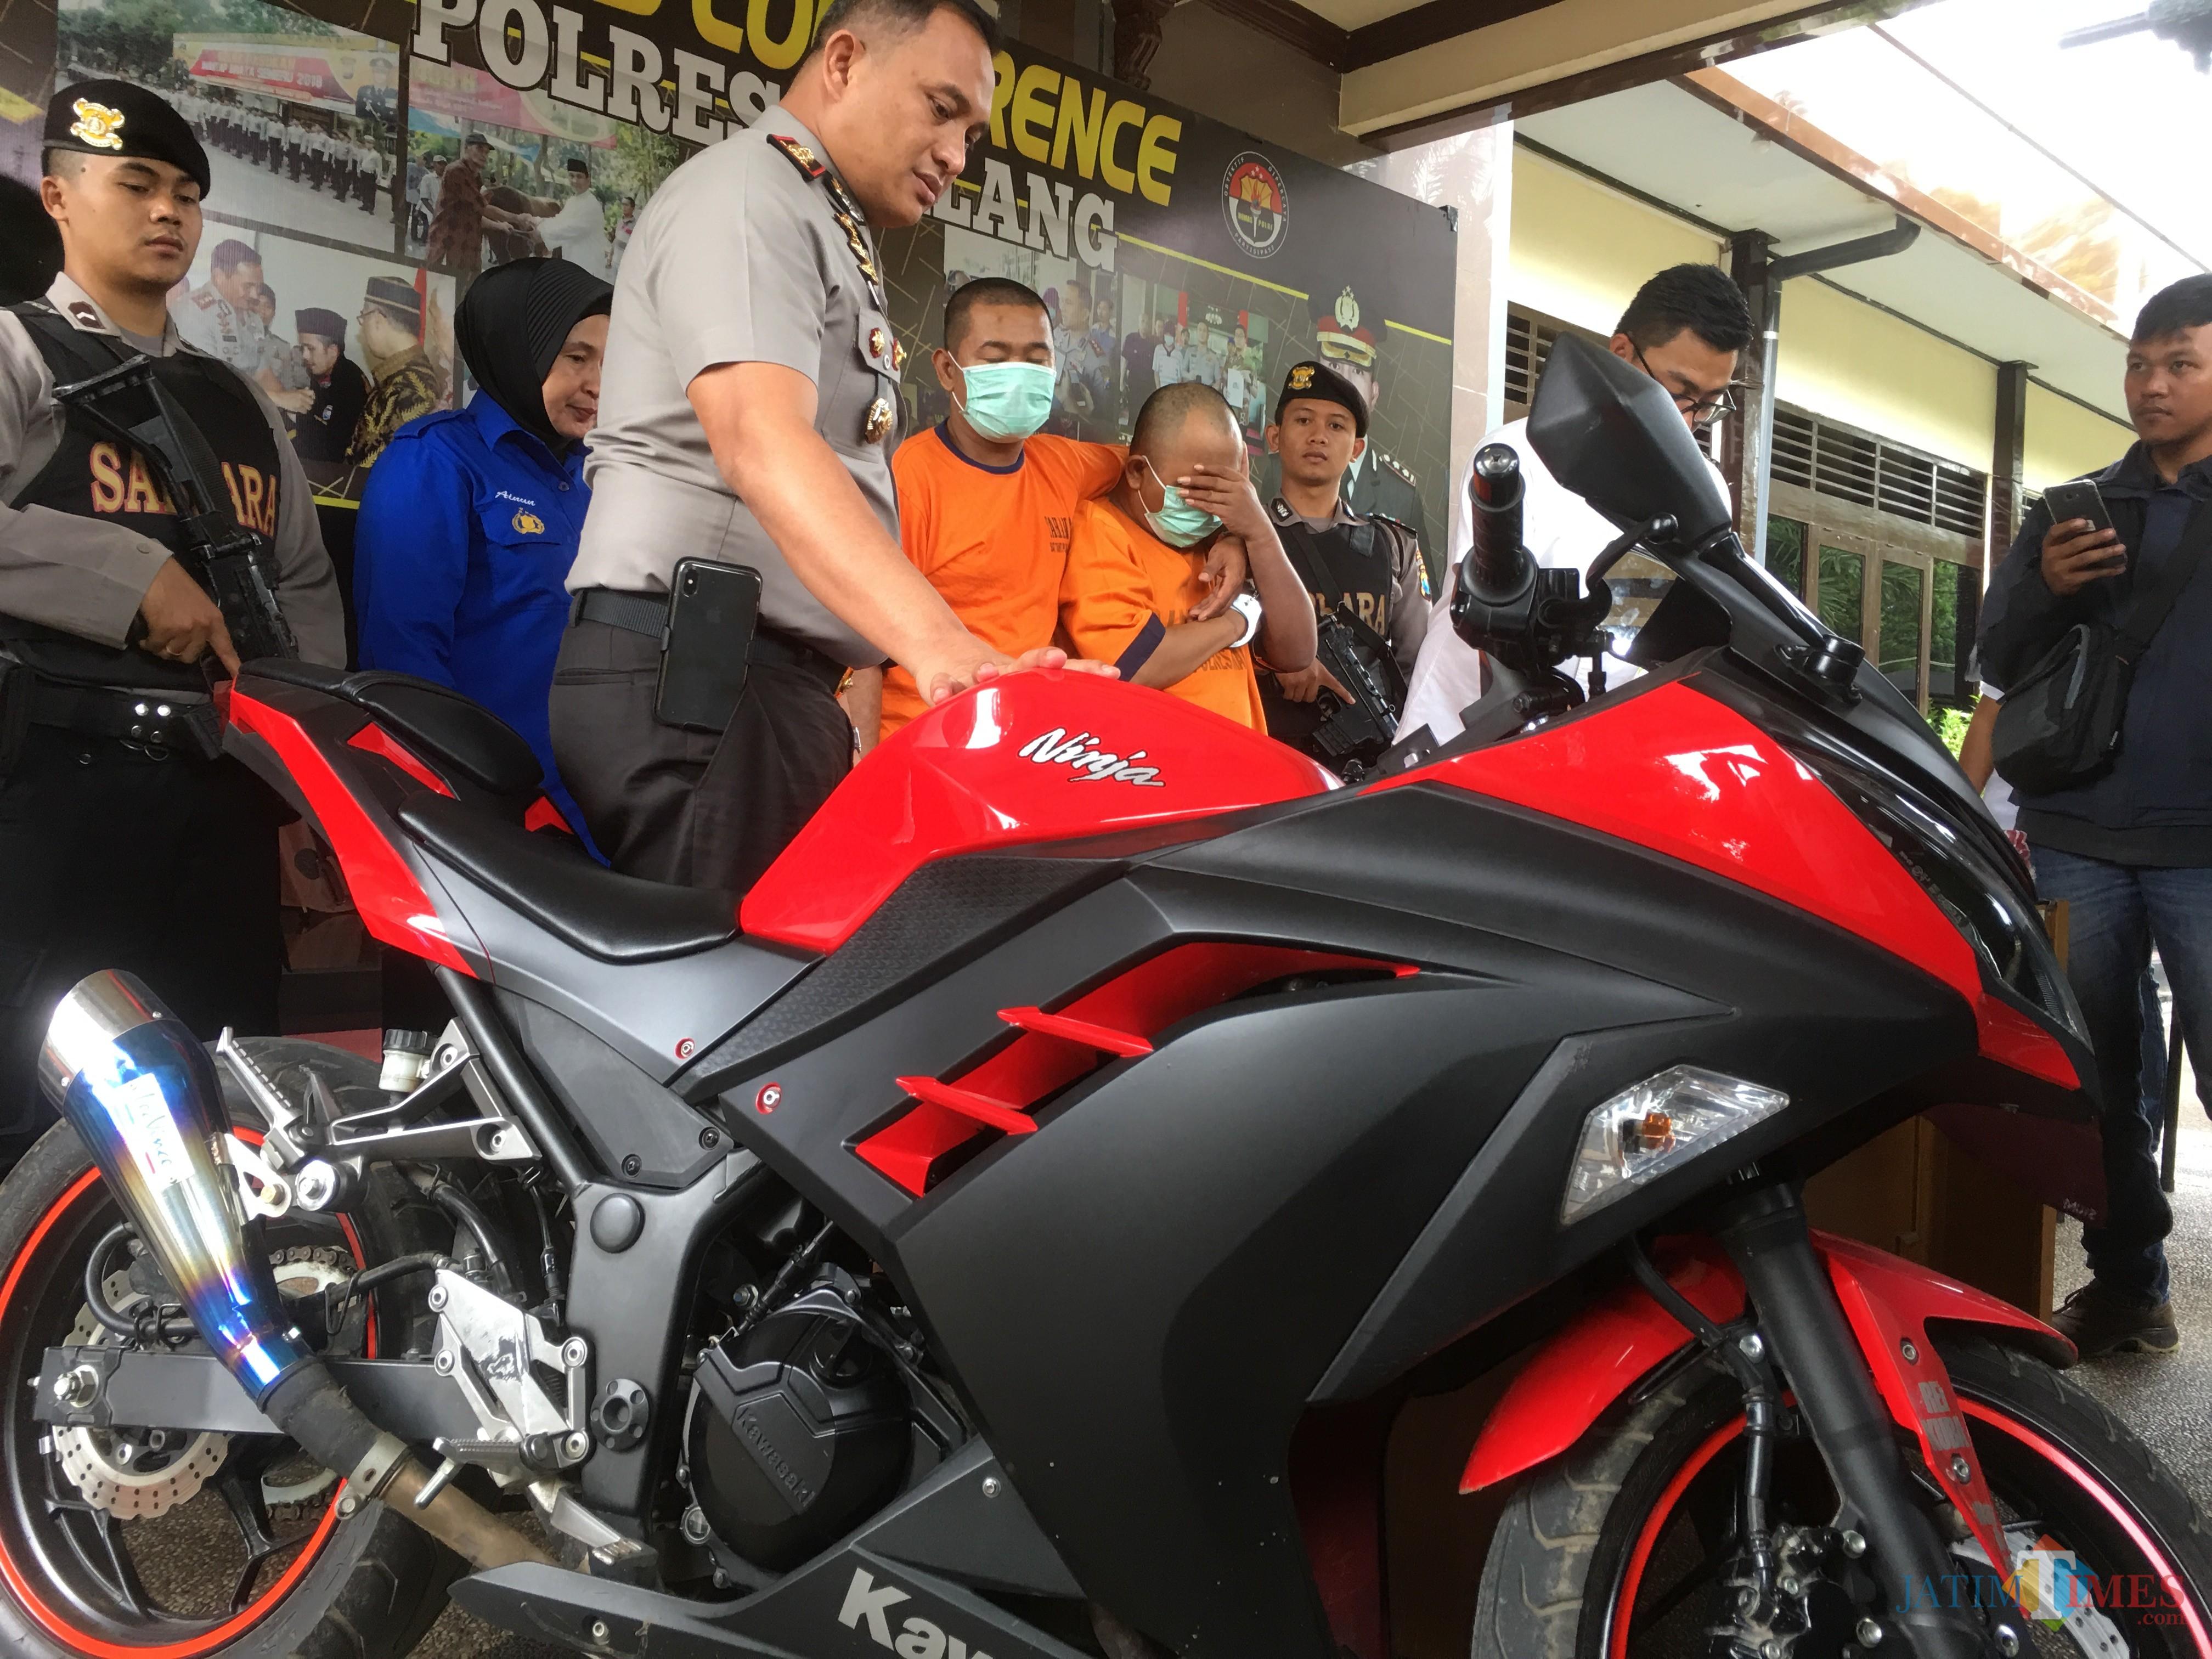 Anis tersangka penjambretan beserta barang bukti saat diamankan polisi, Kabupaten Malang (Foto : Ashaq Lupito / MalangTIMES)